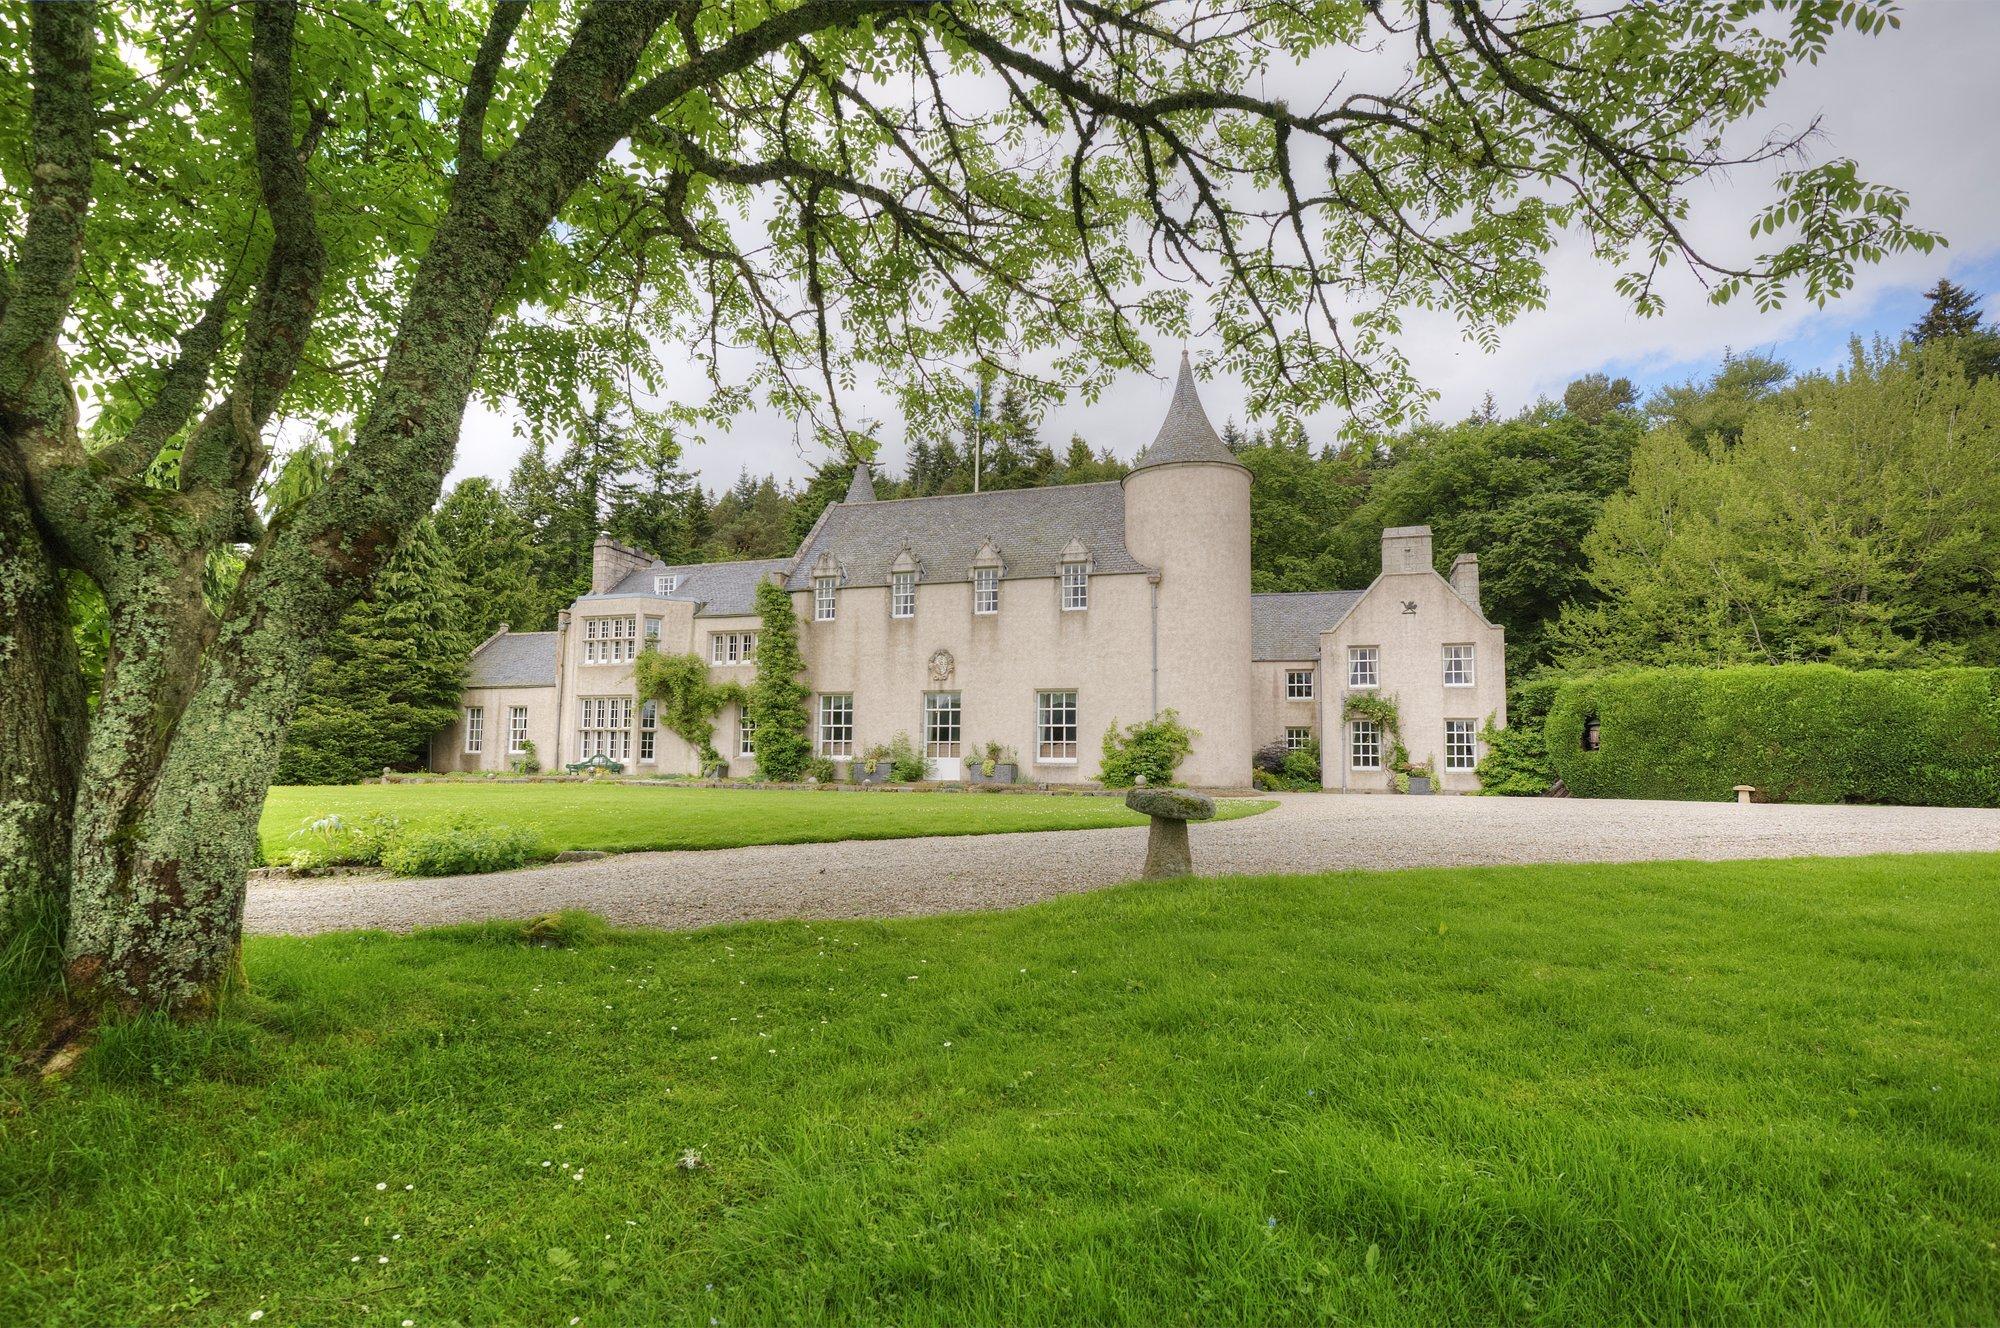 Candacraig House